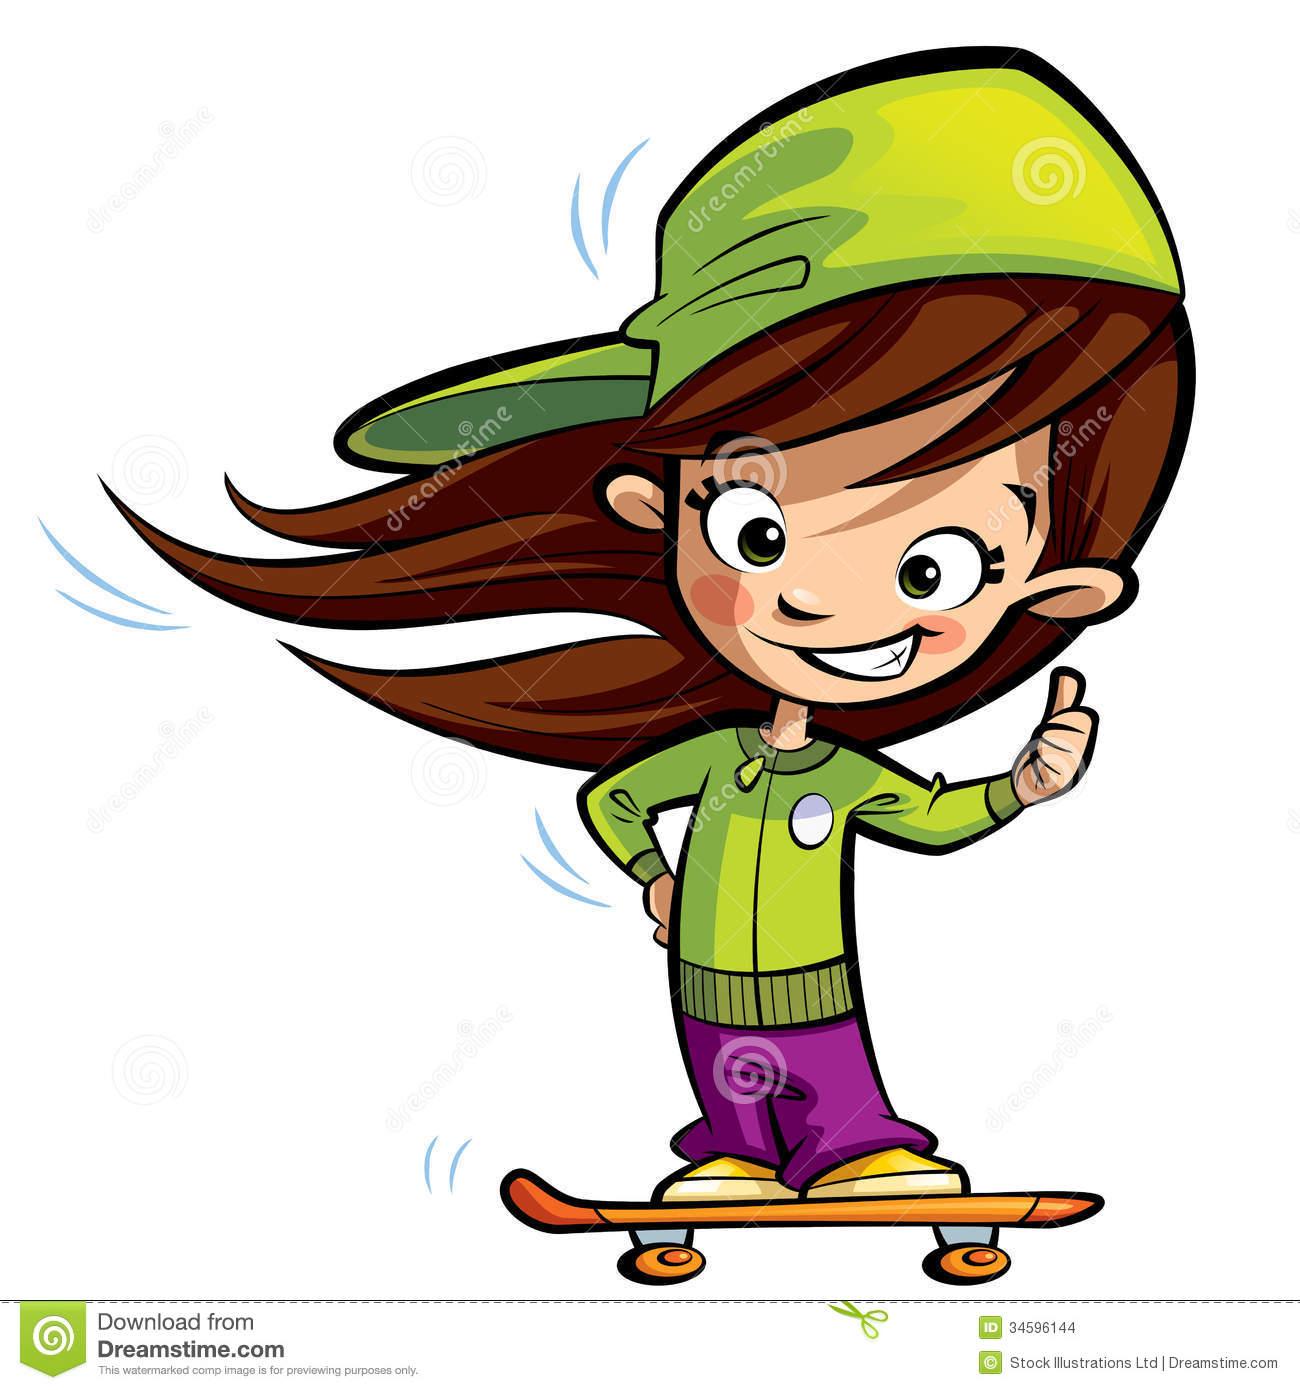 Girl Skateboard Clipart - Clipart Kid